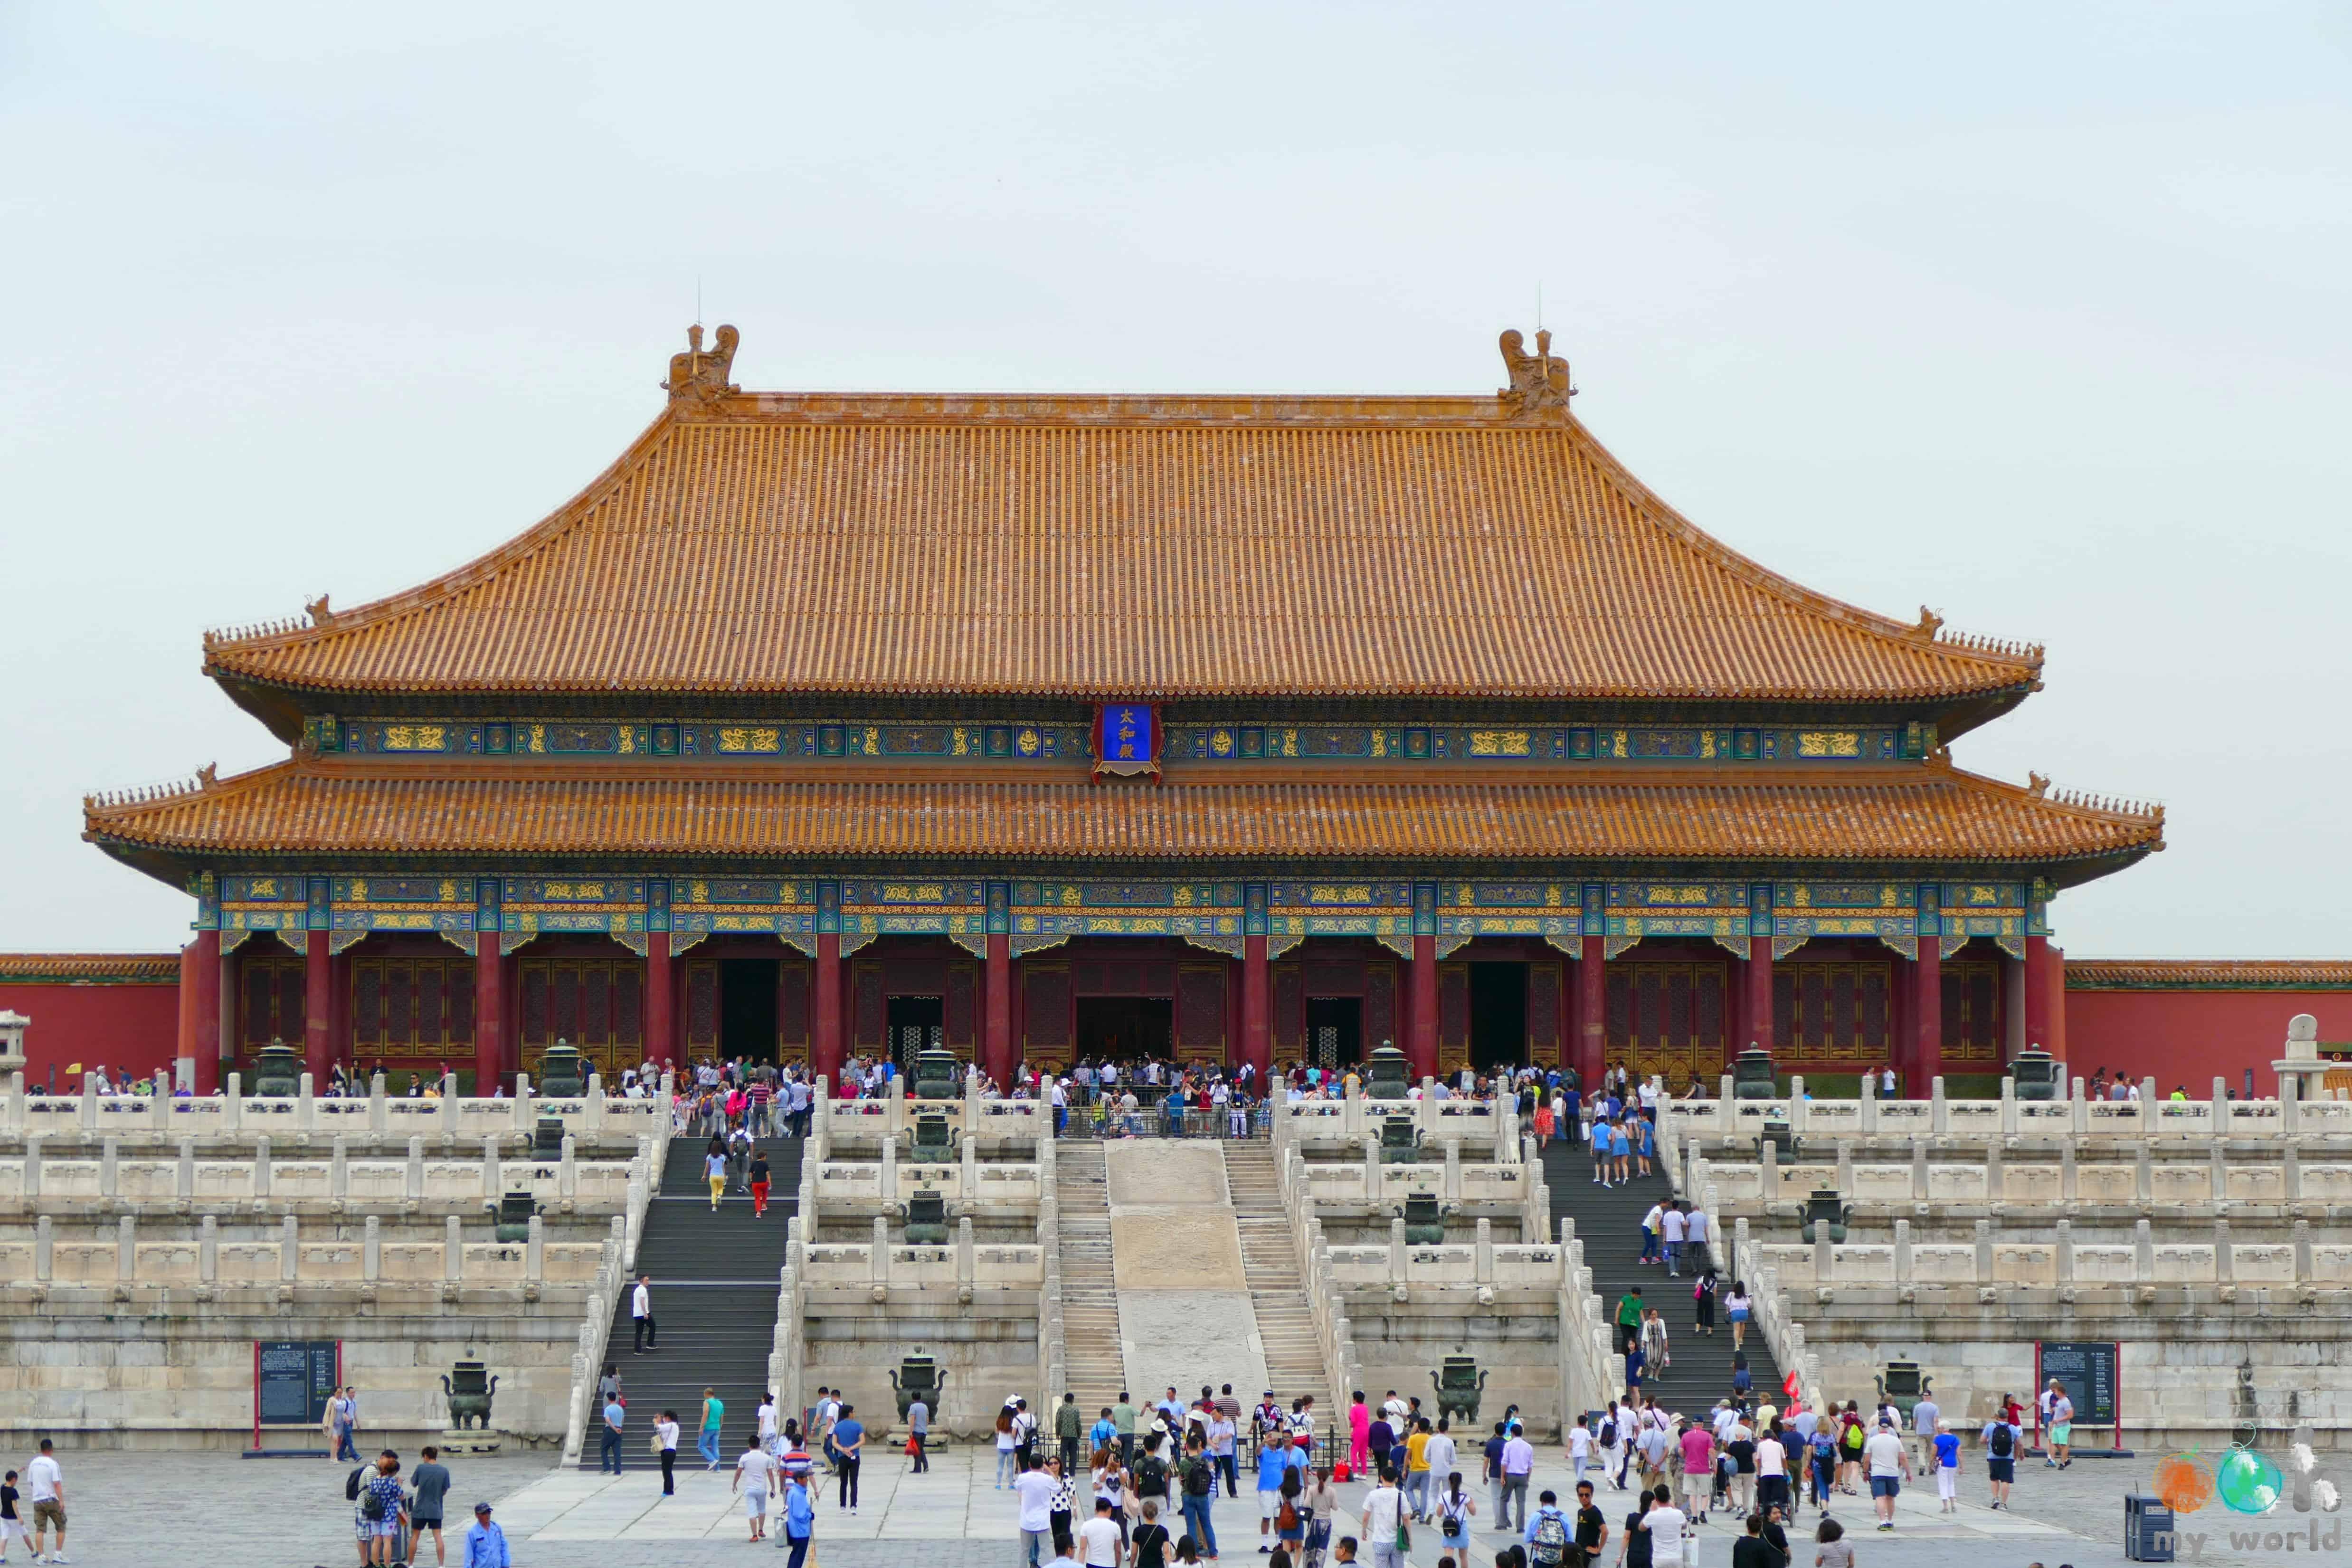 Porte de la Cité Interdite de Pékin